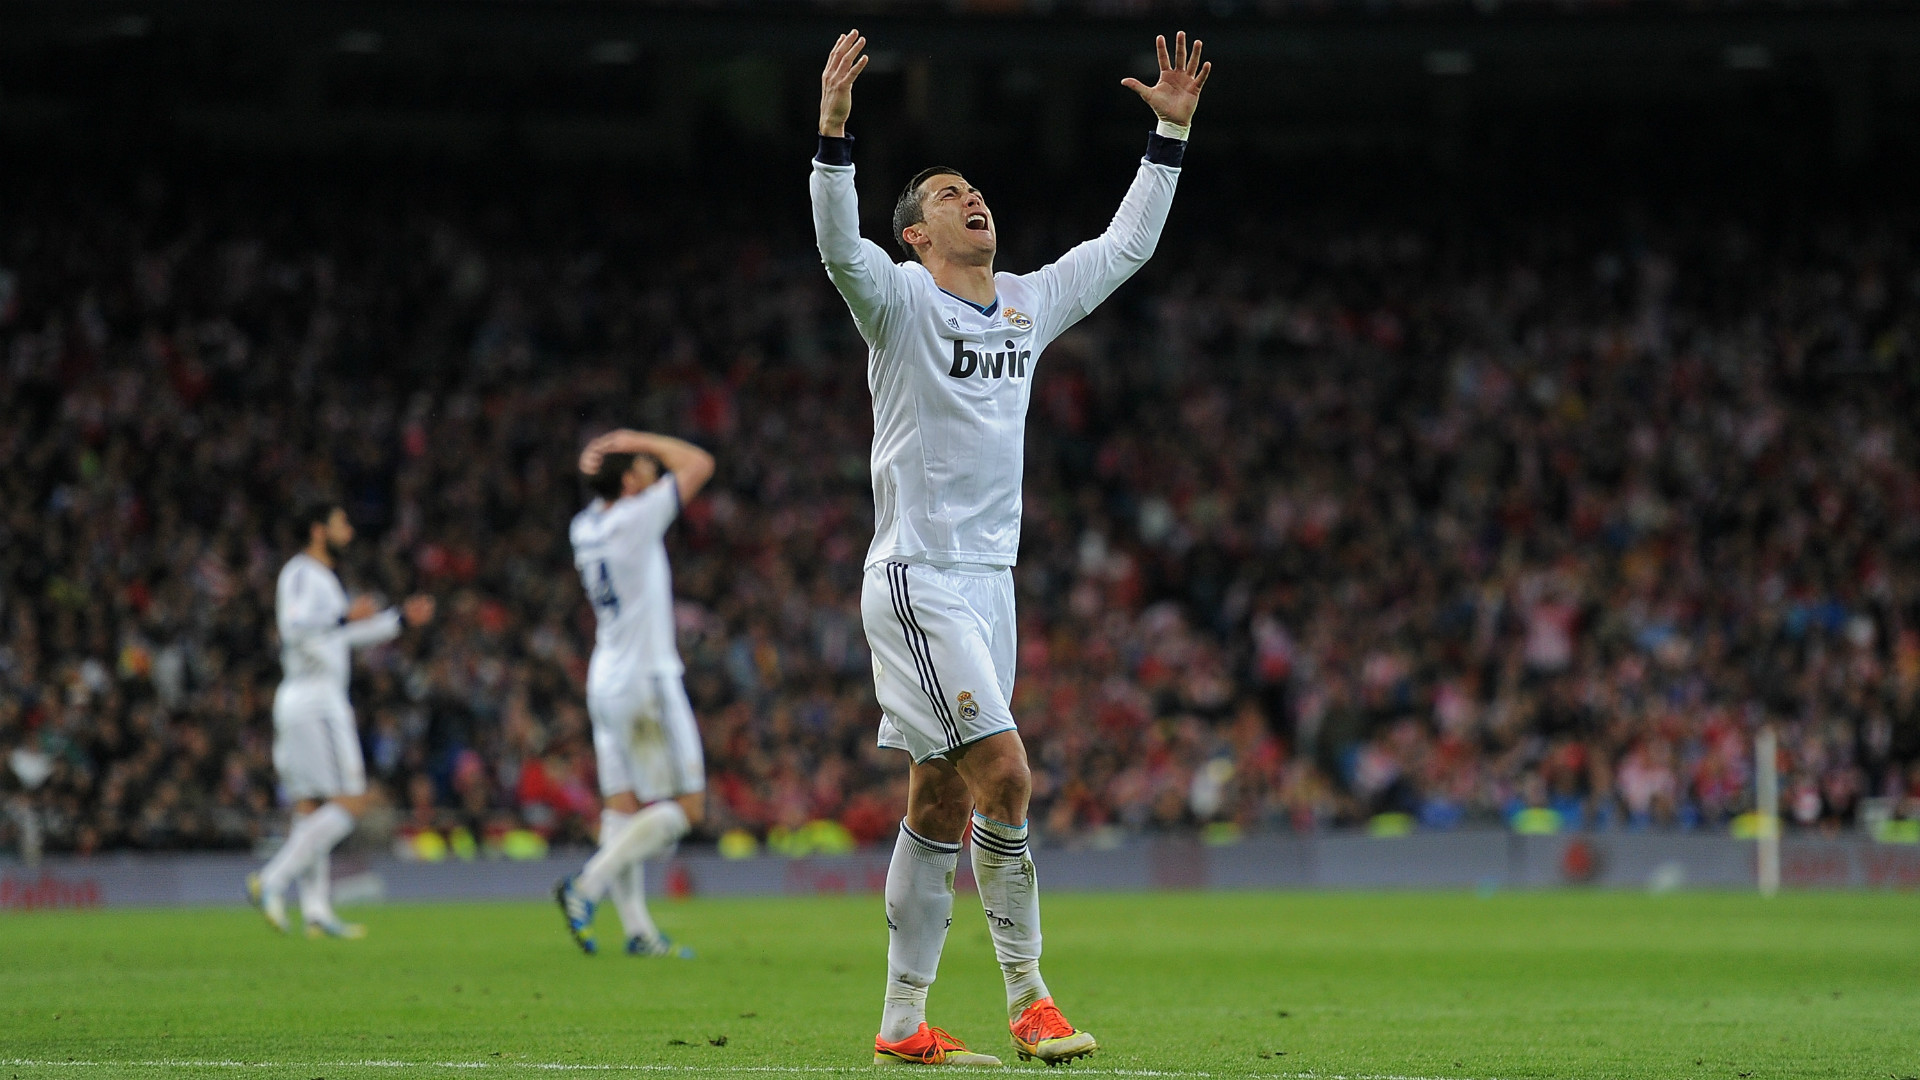 Zidane. Regresso de Cristiano Ronaldo